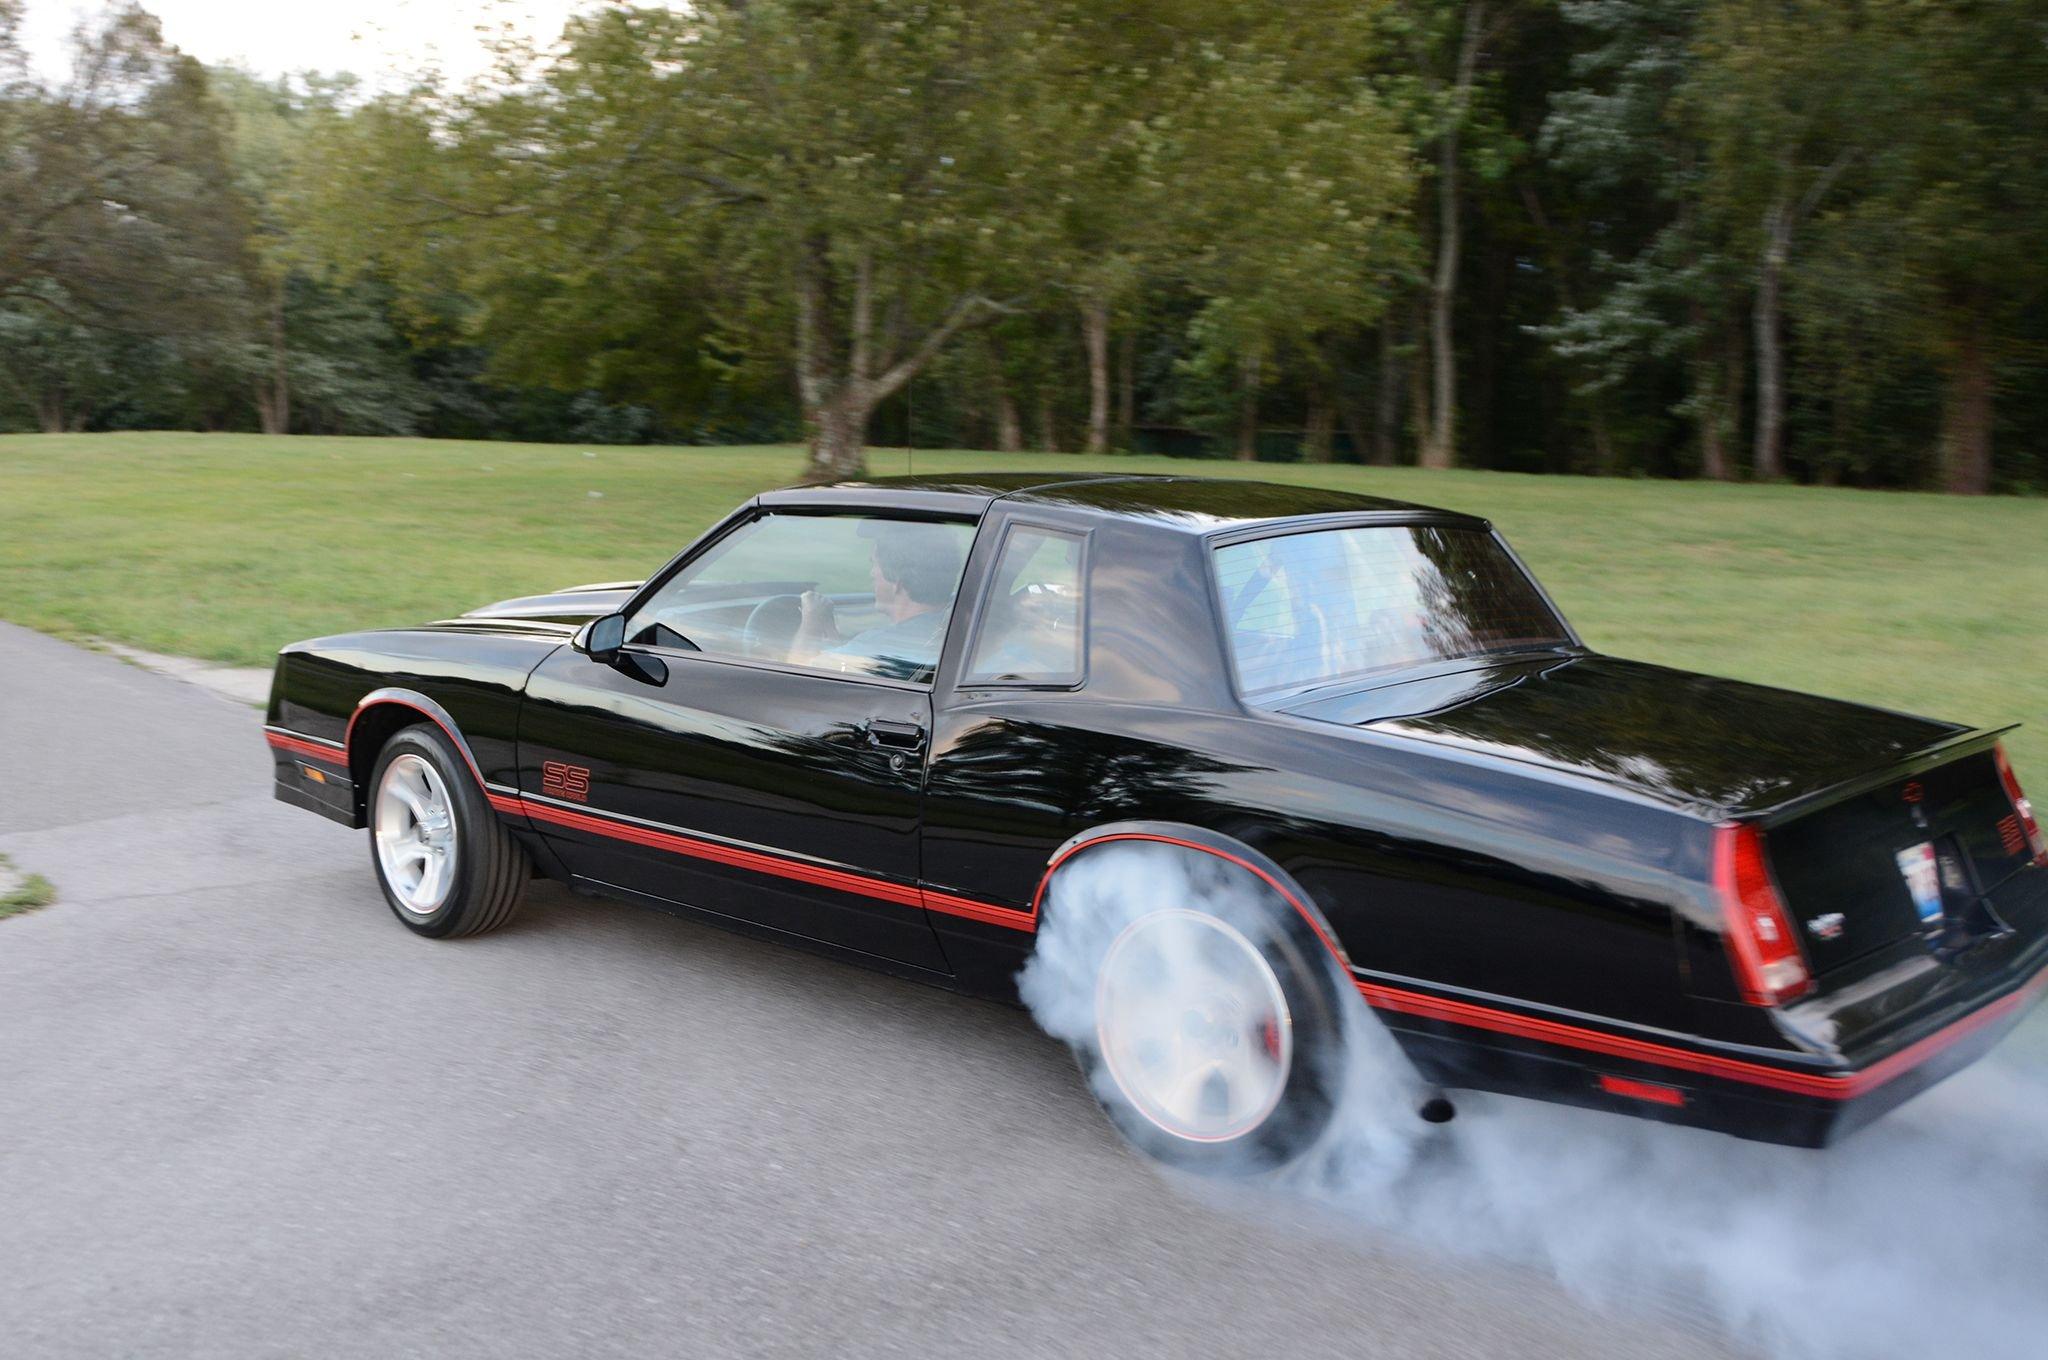 1988 Monte Carlo S S Chevrolet Muscle Wallpaper